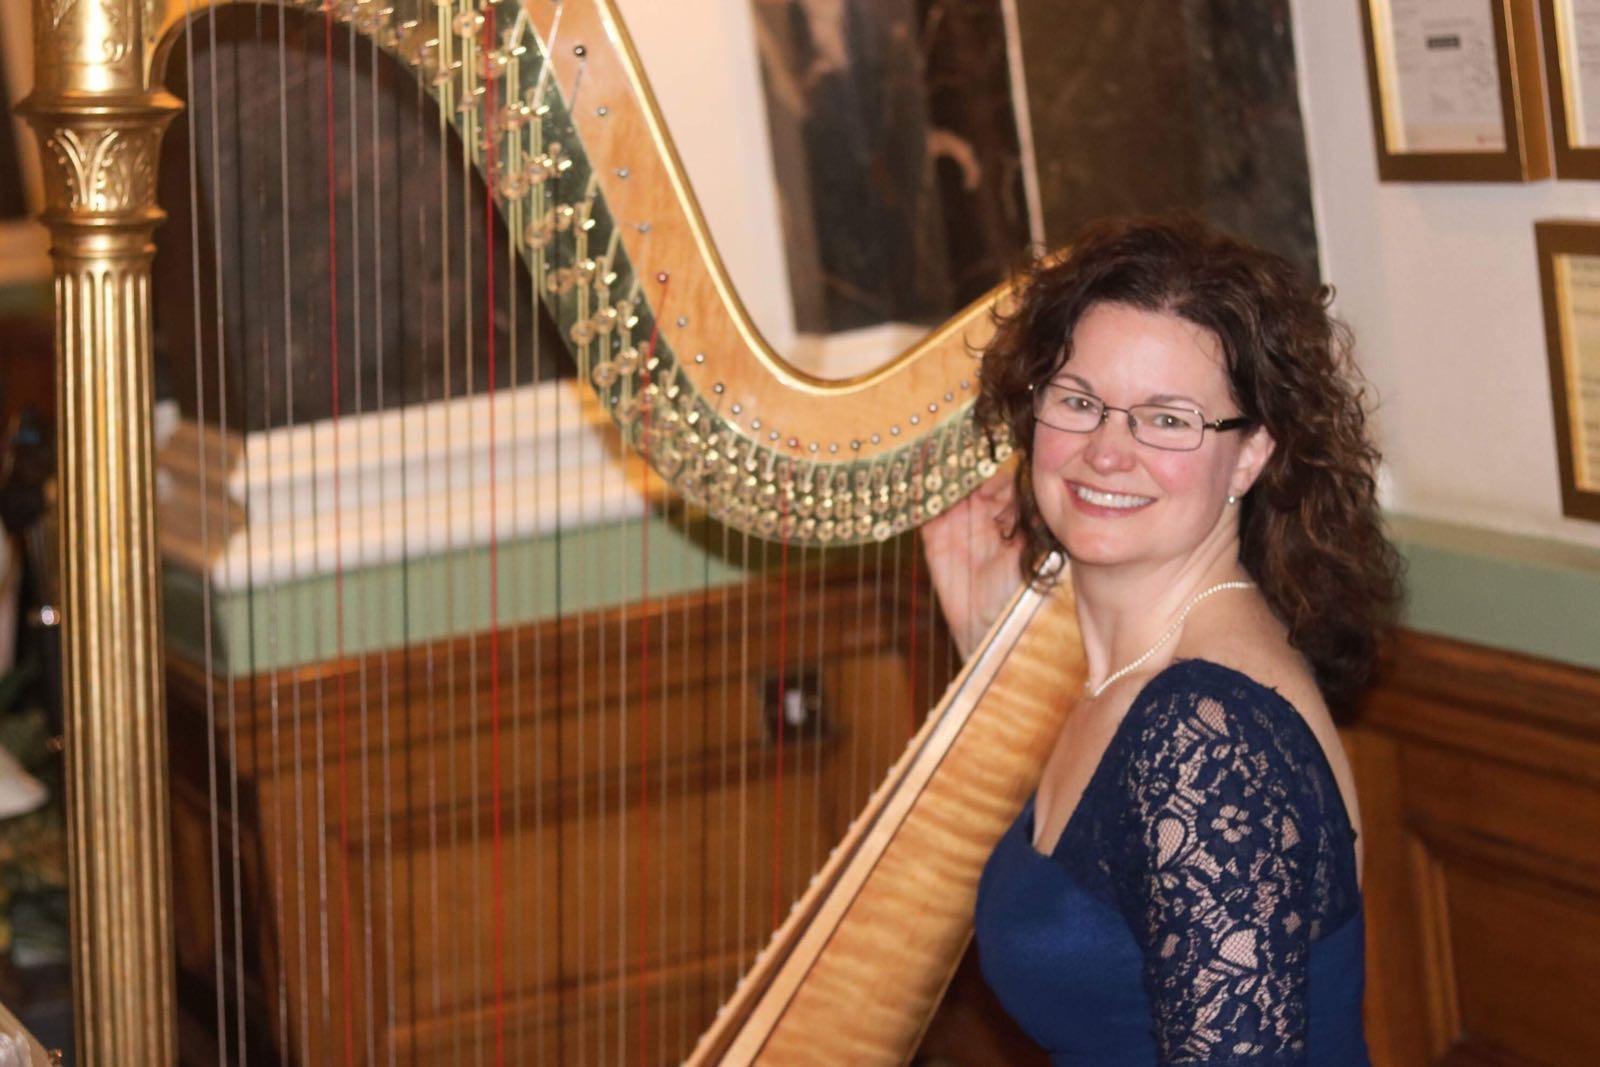 Birmingham harp player